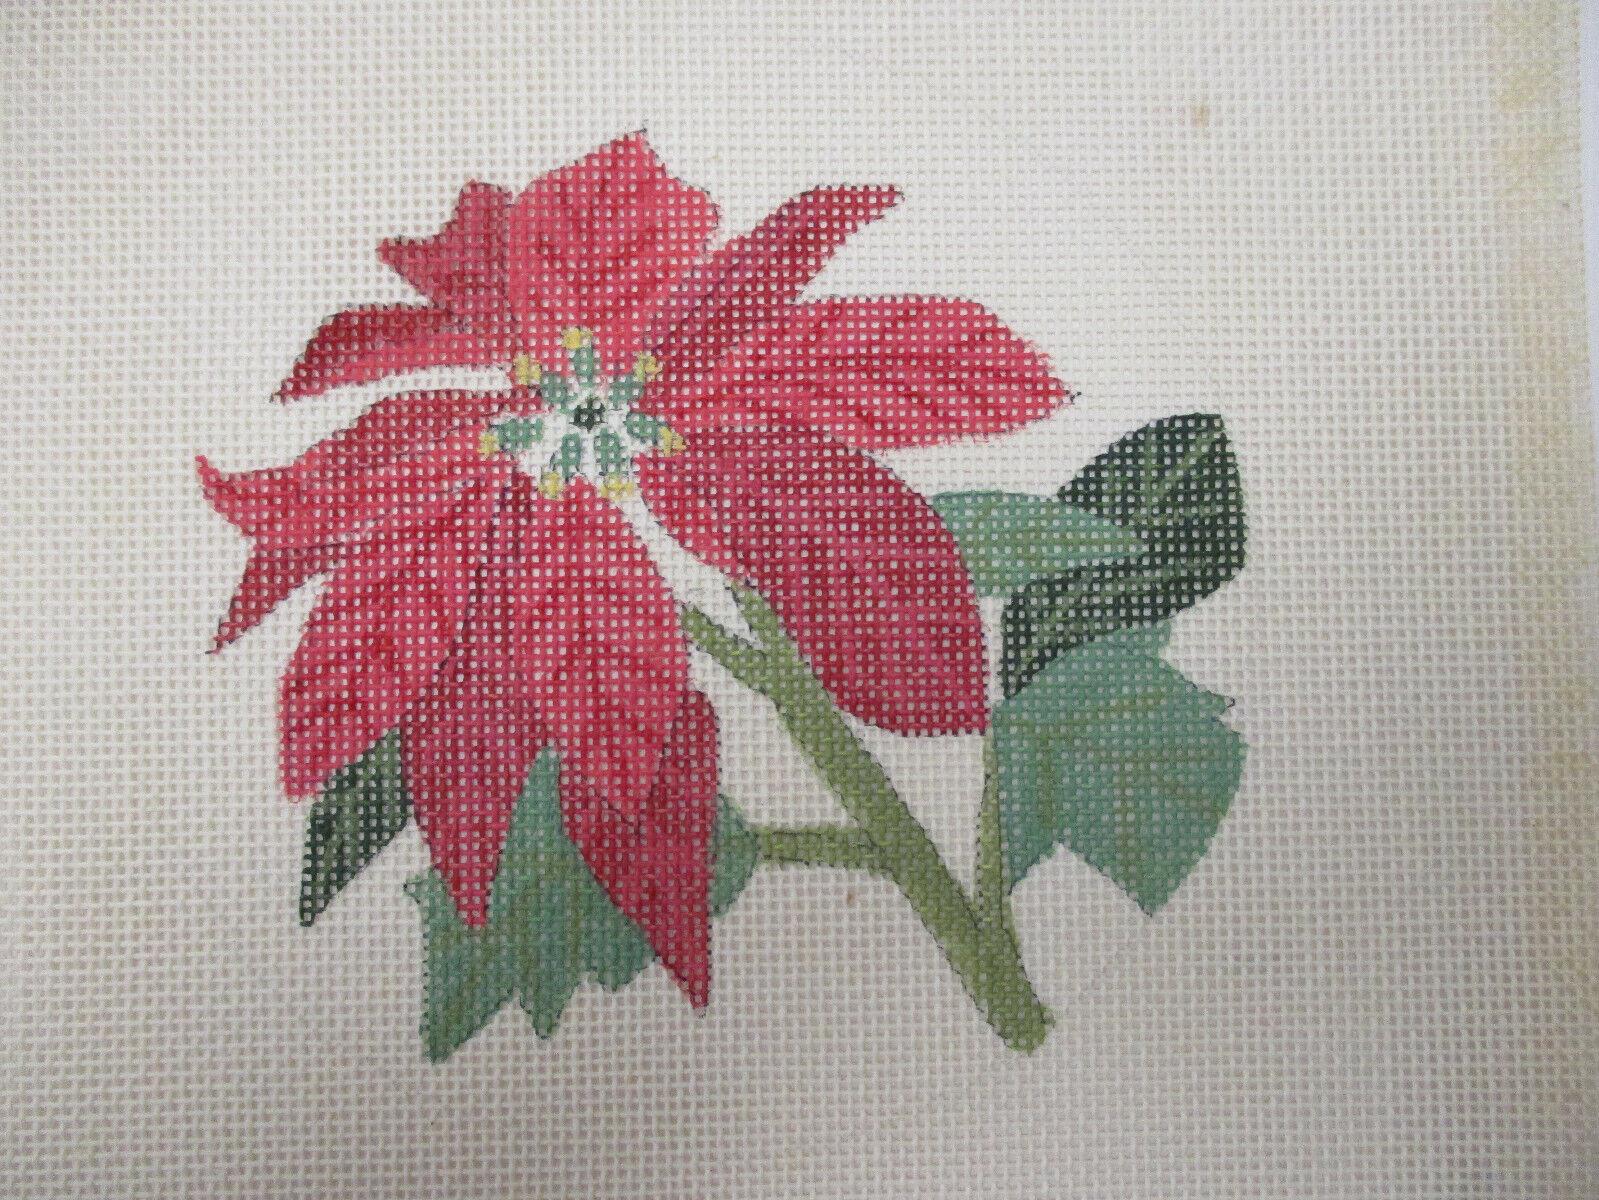 L Caron Handpainted Needlepoint Canvas Poinsettia Single Flower 18 Mesh - $18.00